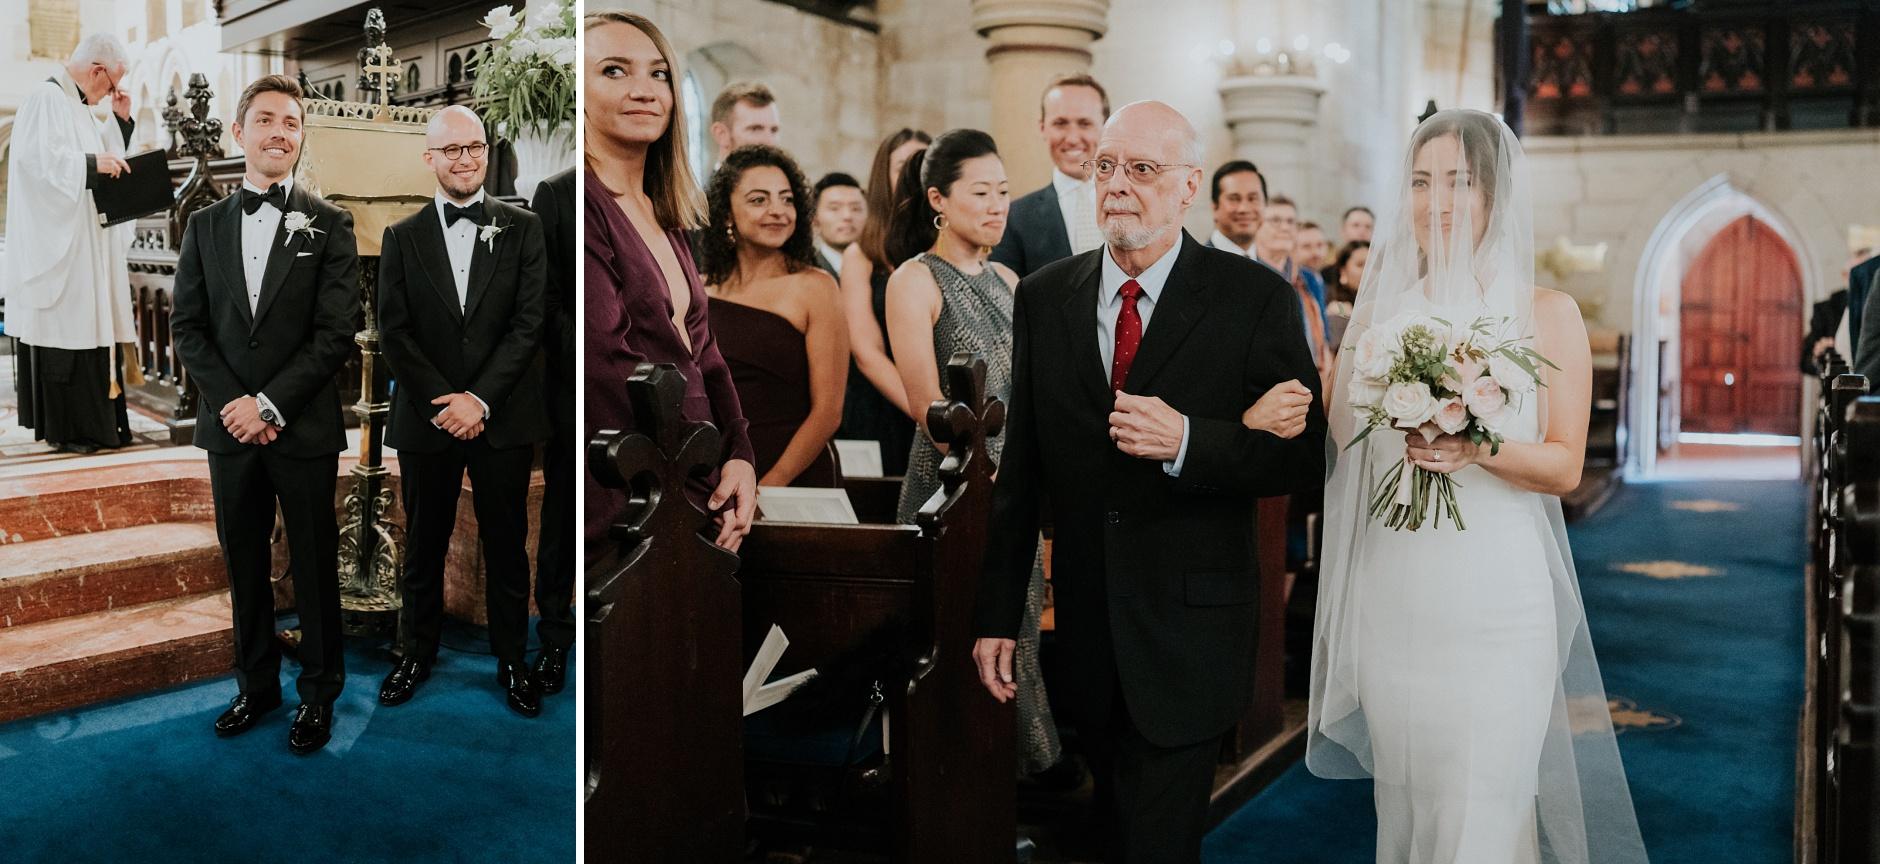 Sydney-Wedding-Photographer_0020.jpg